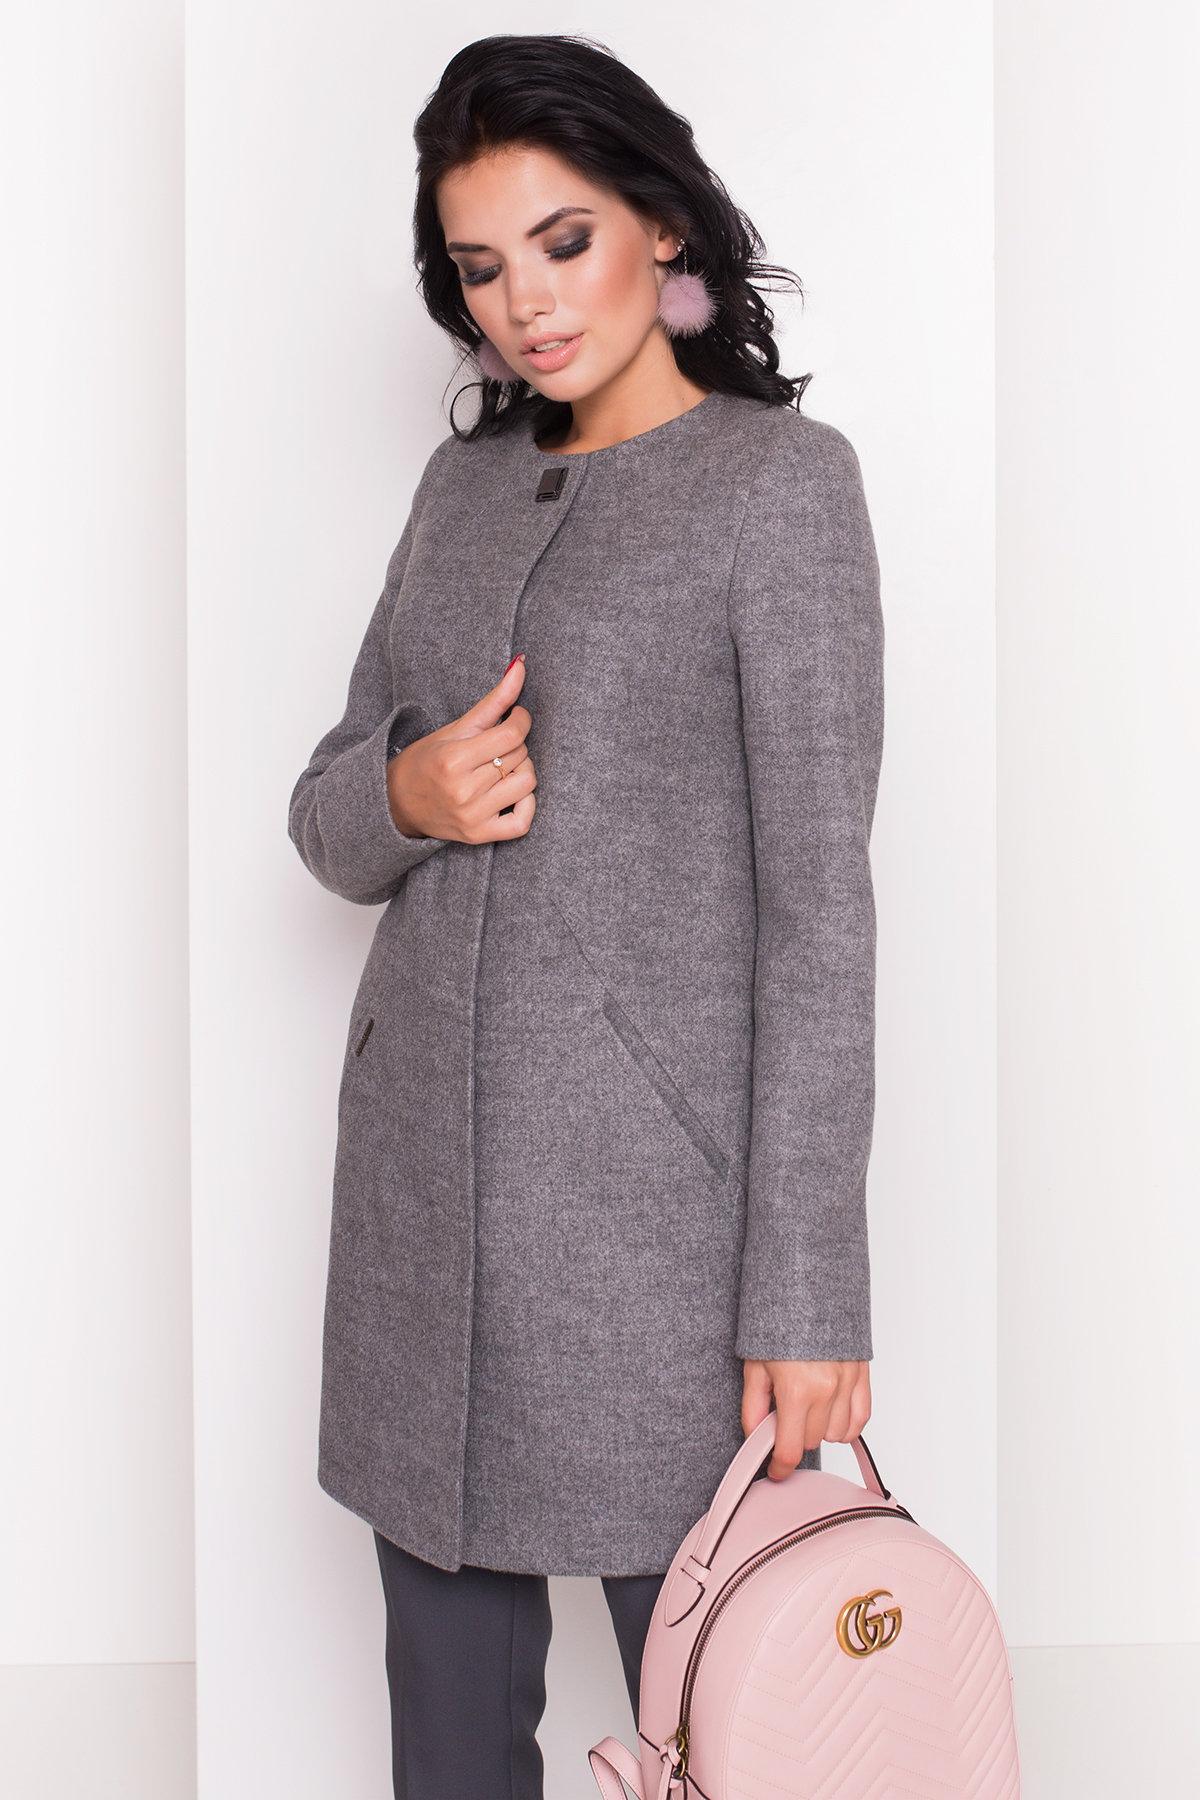 Пальто Шаника 5379 Цвет: Серый 18